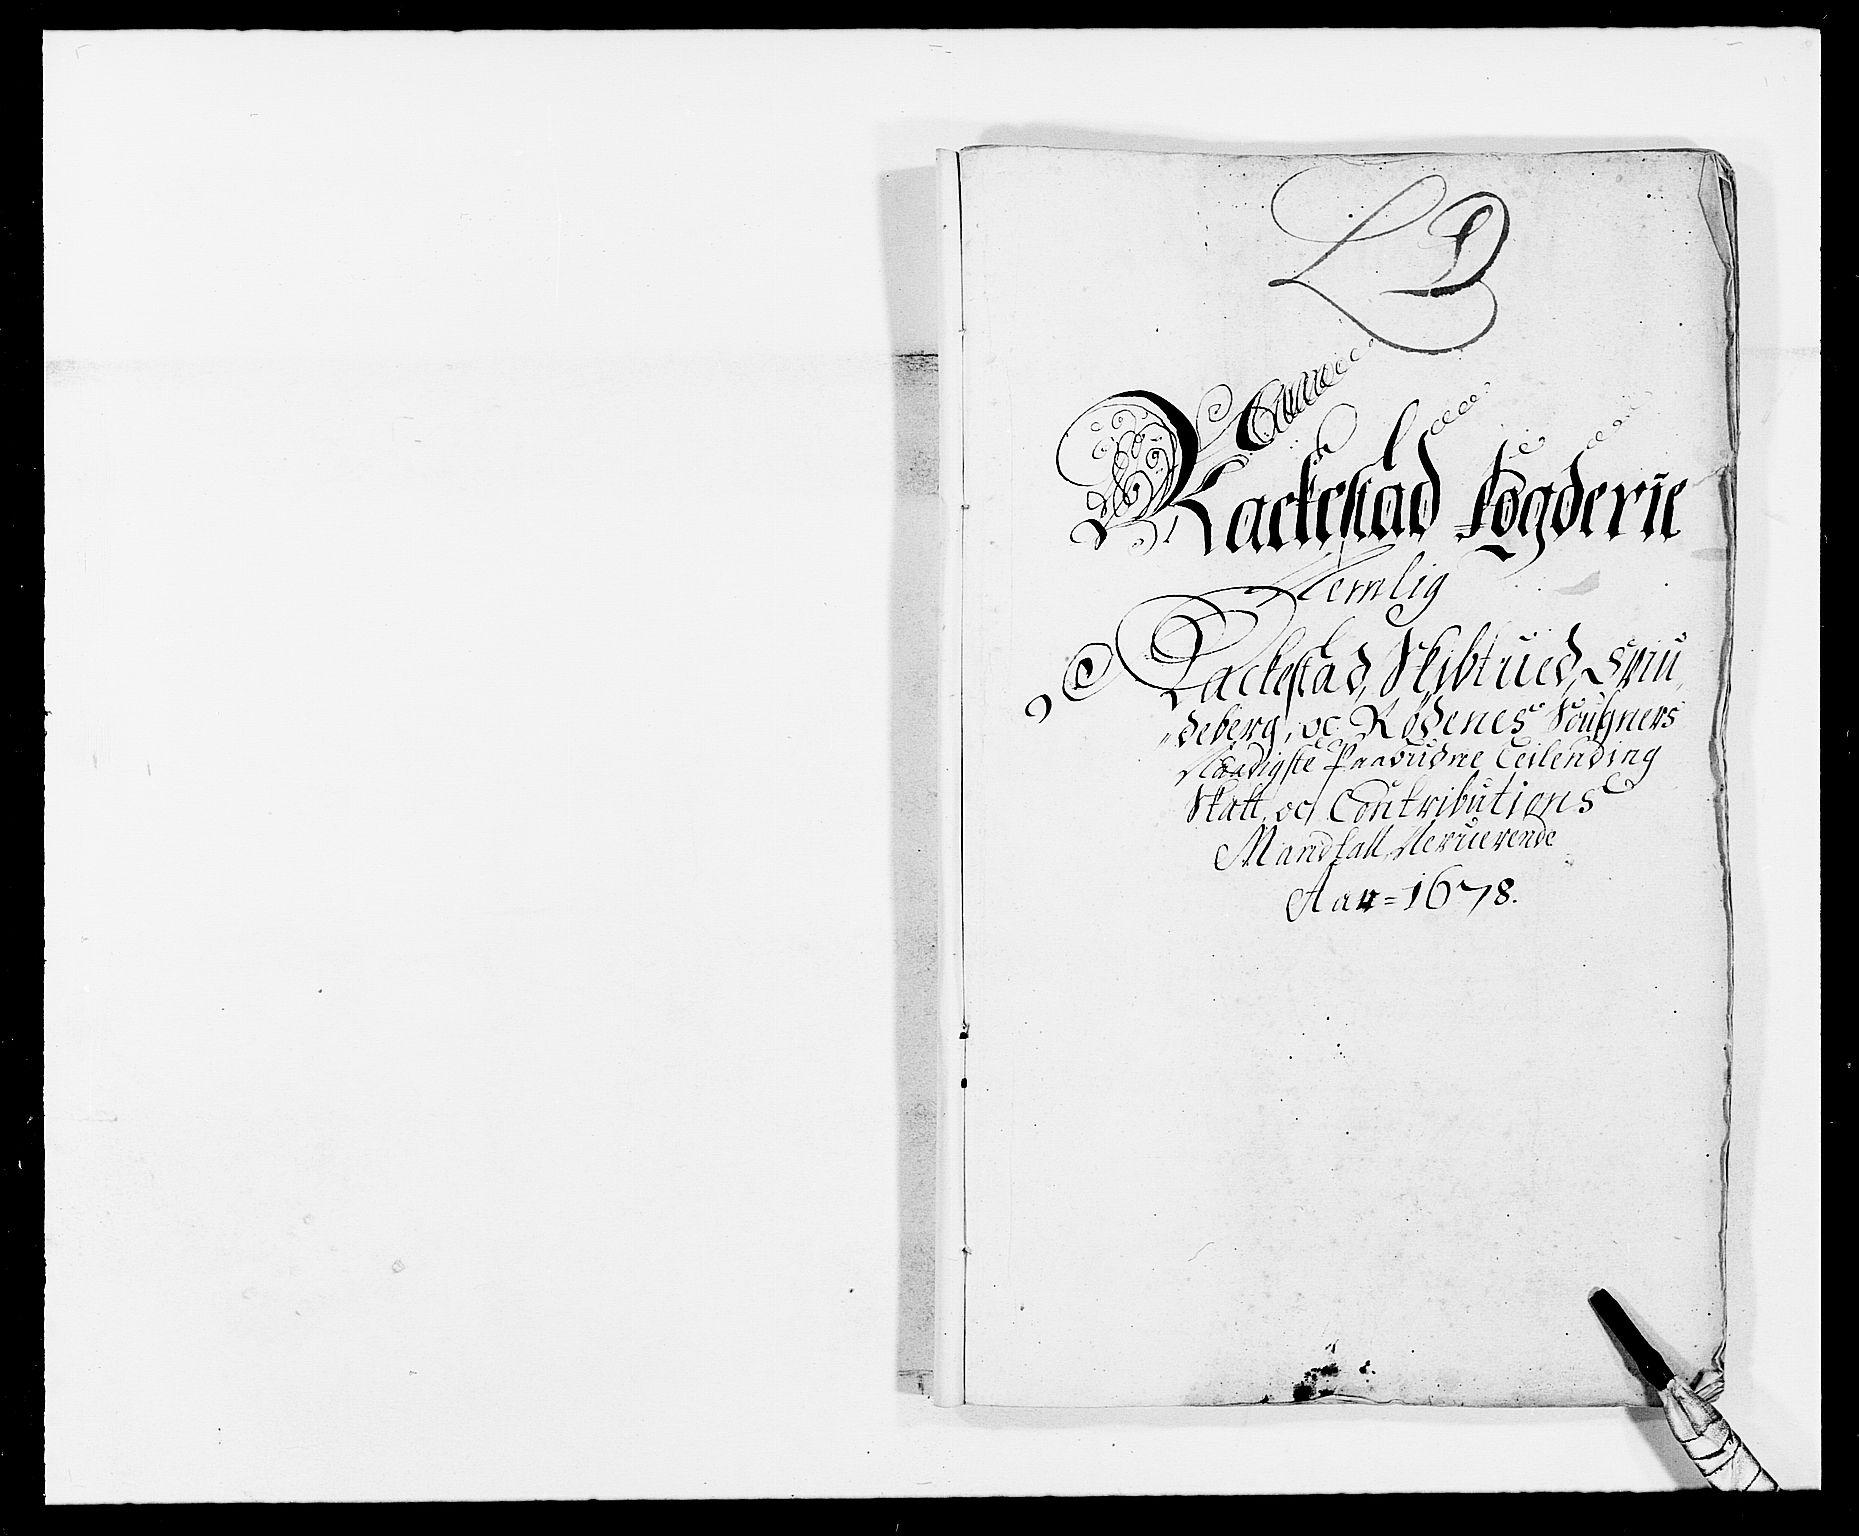 RA, Rentekammeret inntil 1814, Reviderte regnskaper, Fogderegnskap, R05/L0271: Fogderegnskap Rakkestad, 1678-1679, s. 63